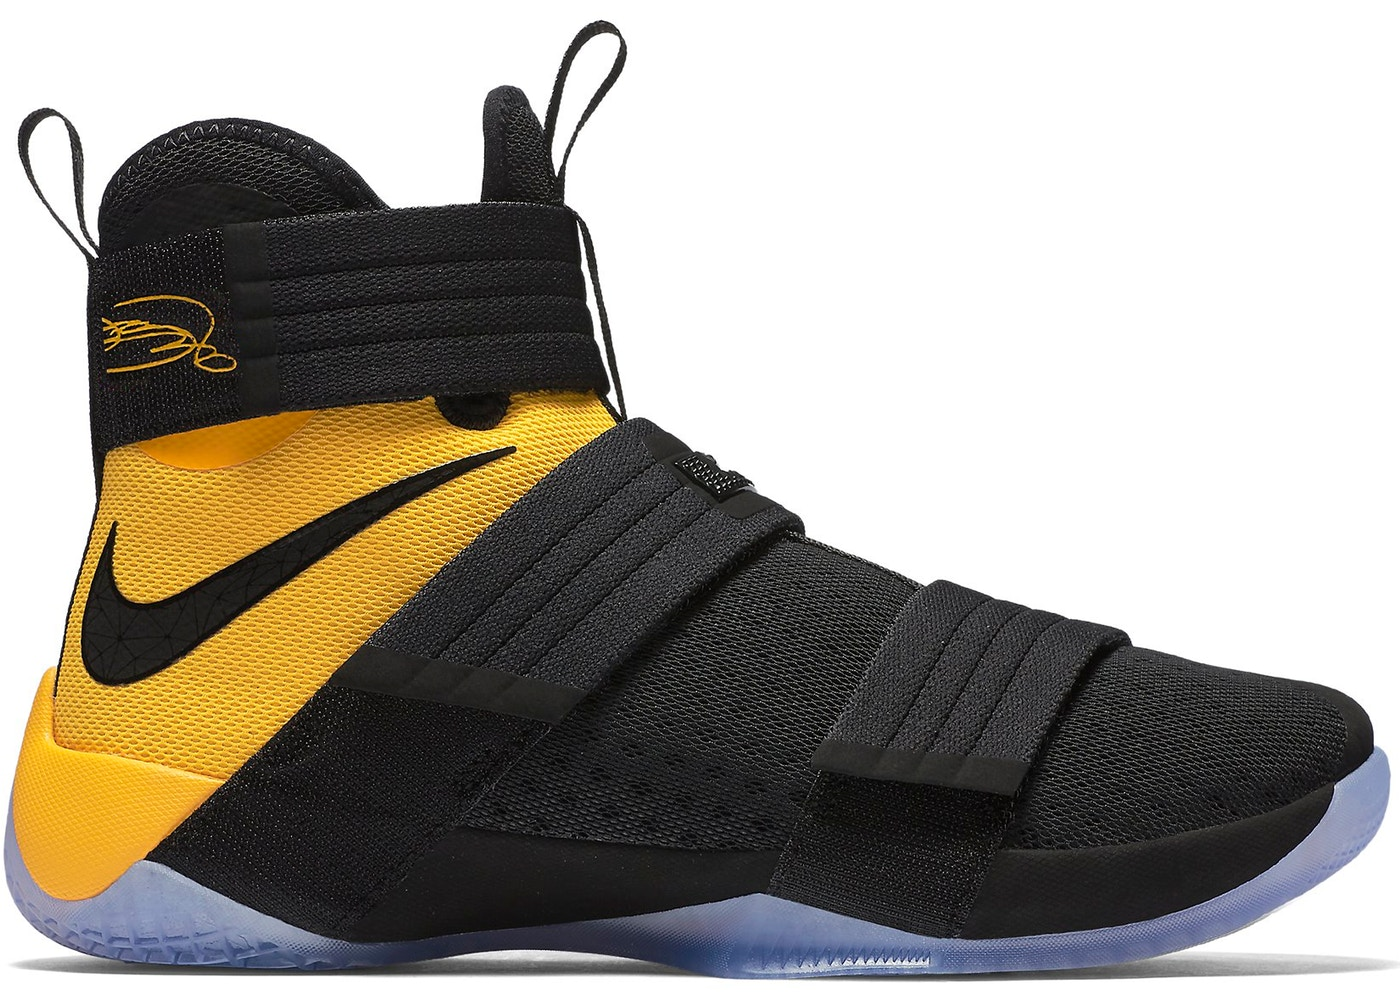 55ba0e5492bd ... LeBron Zoom Soldier 10 Black Uni Gold Nike Lebron Soldier ...